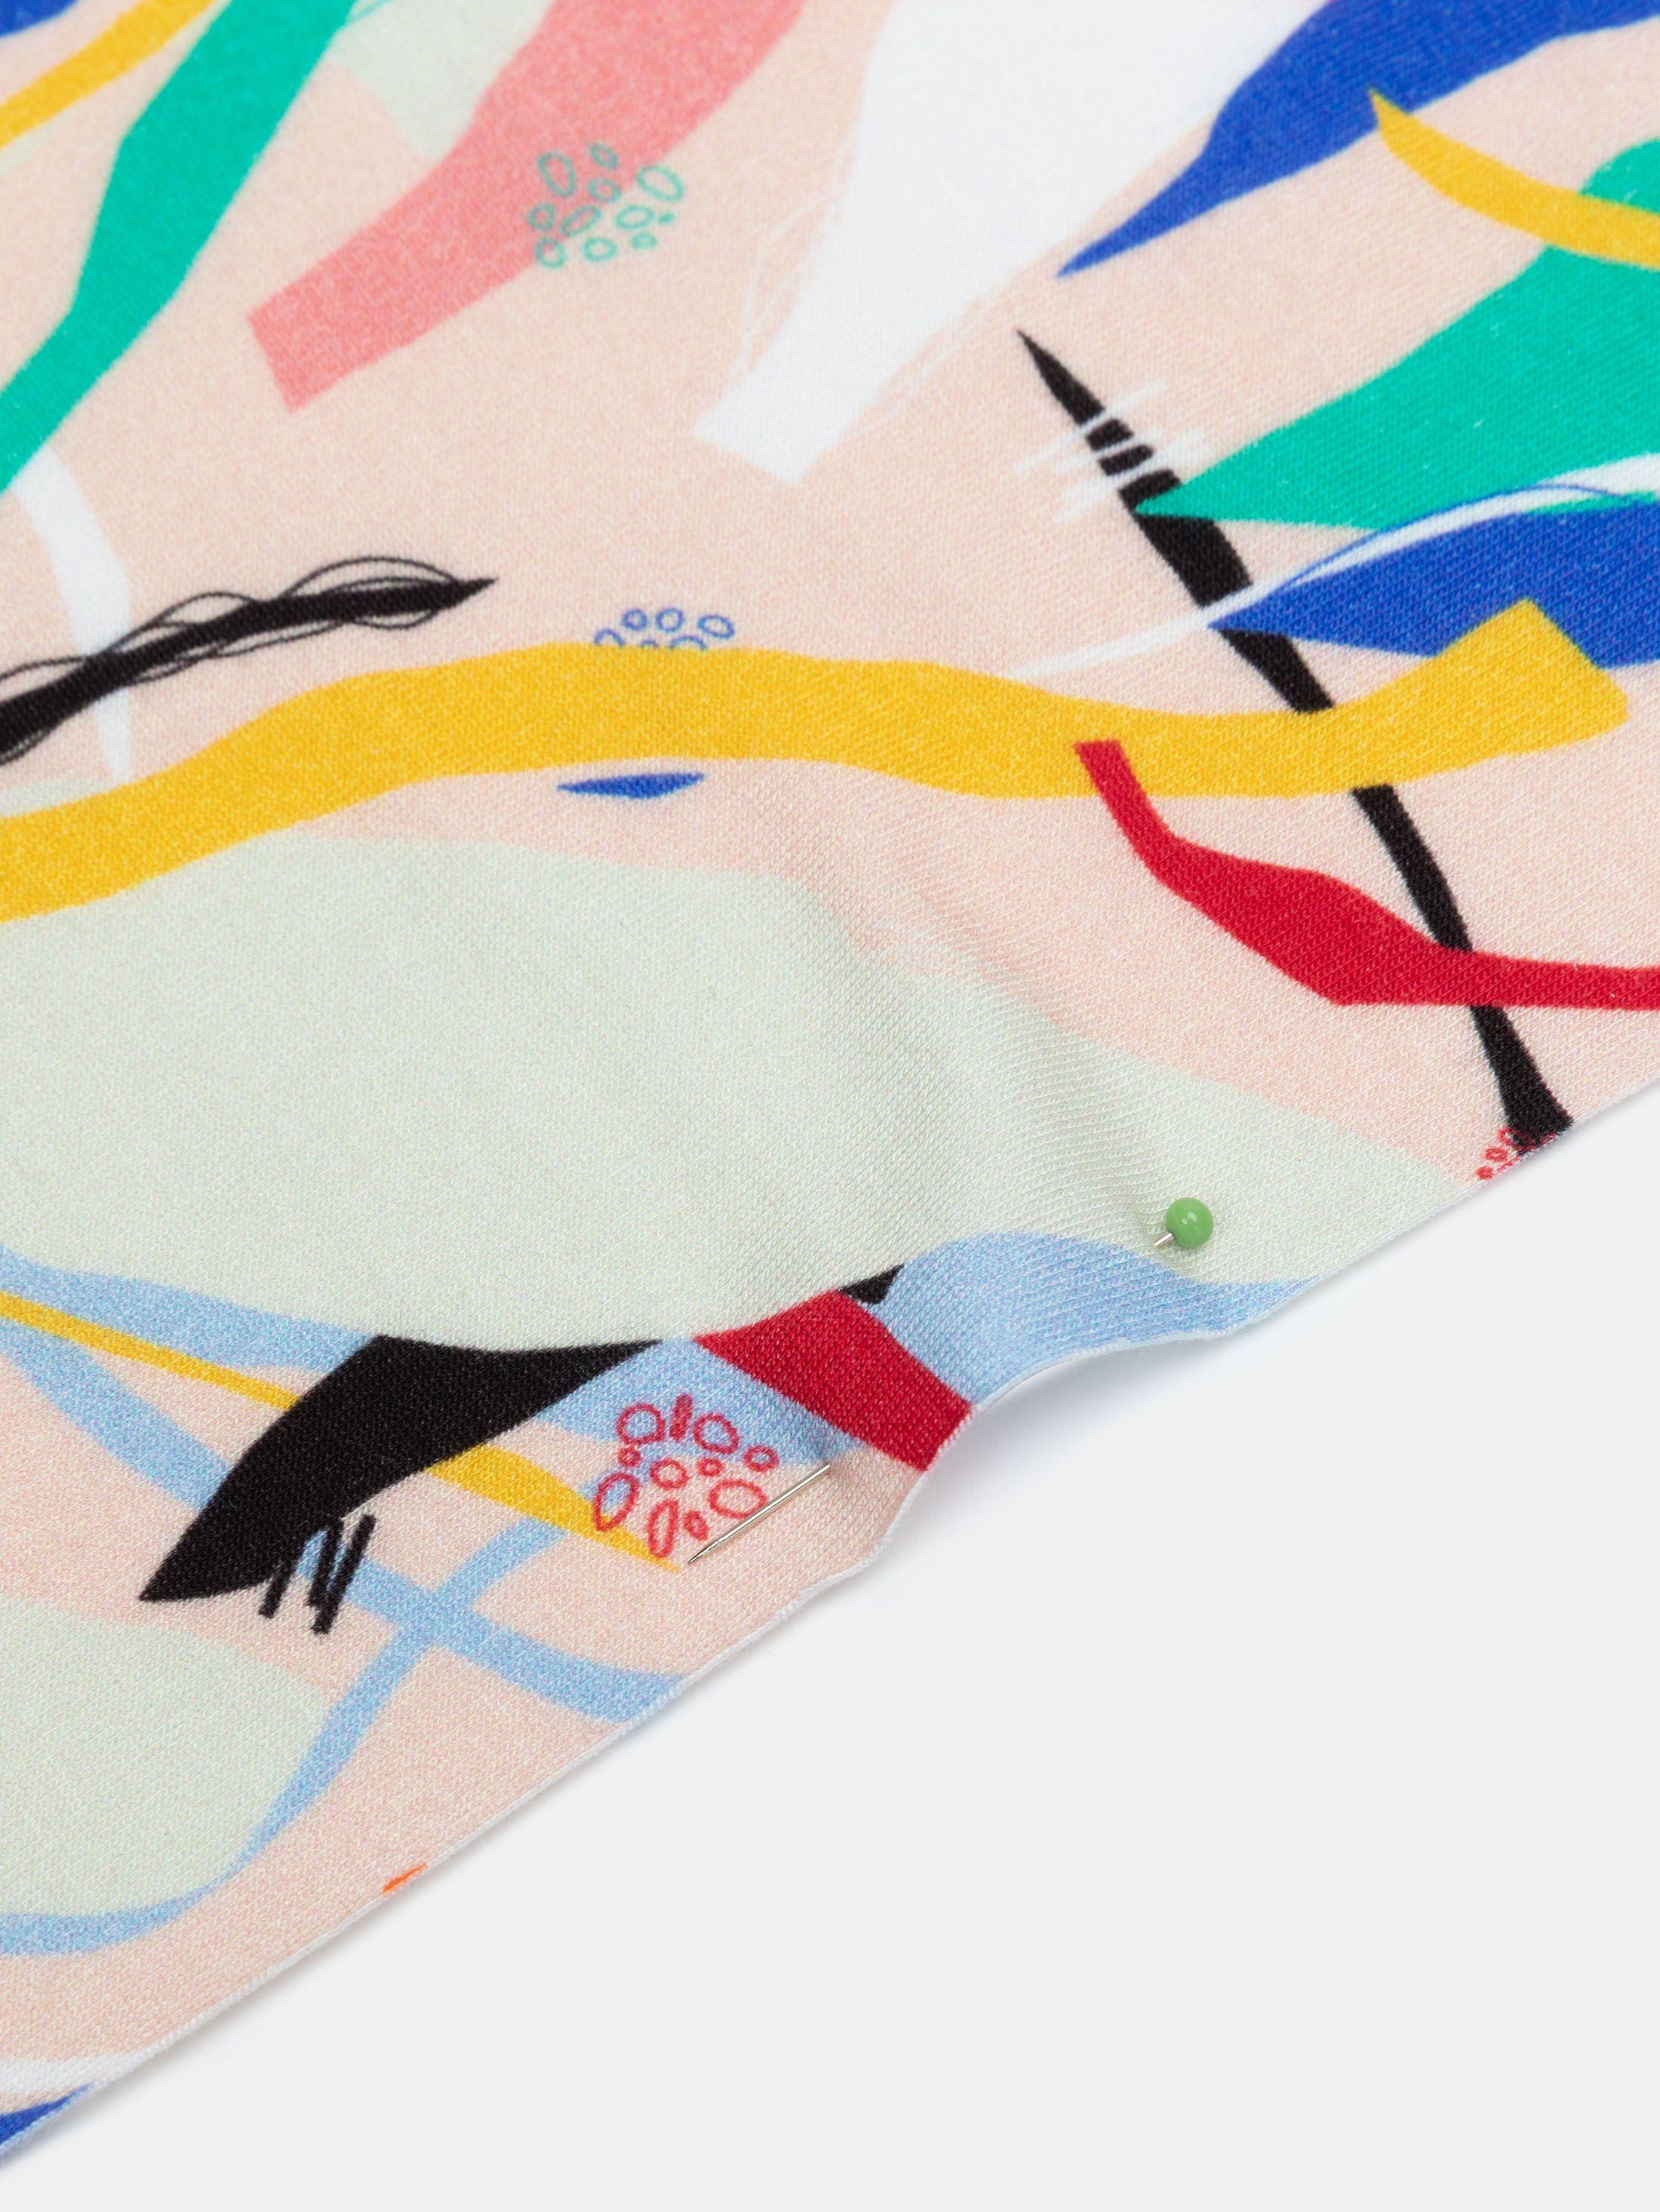 Custom viscose jersey fabric edges